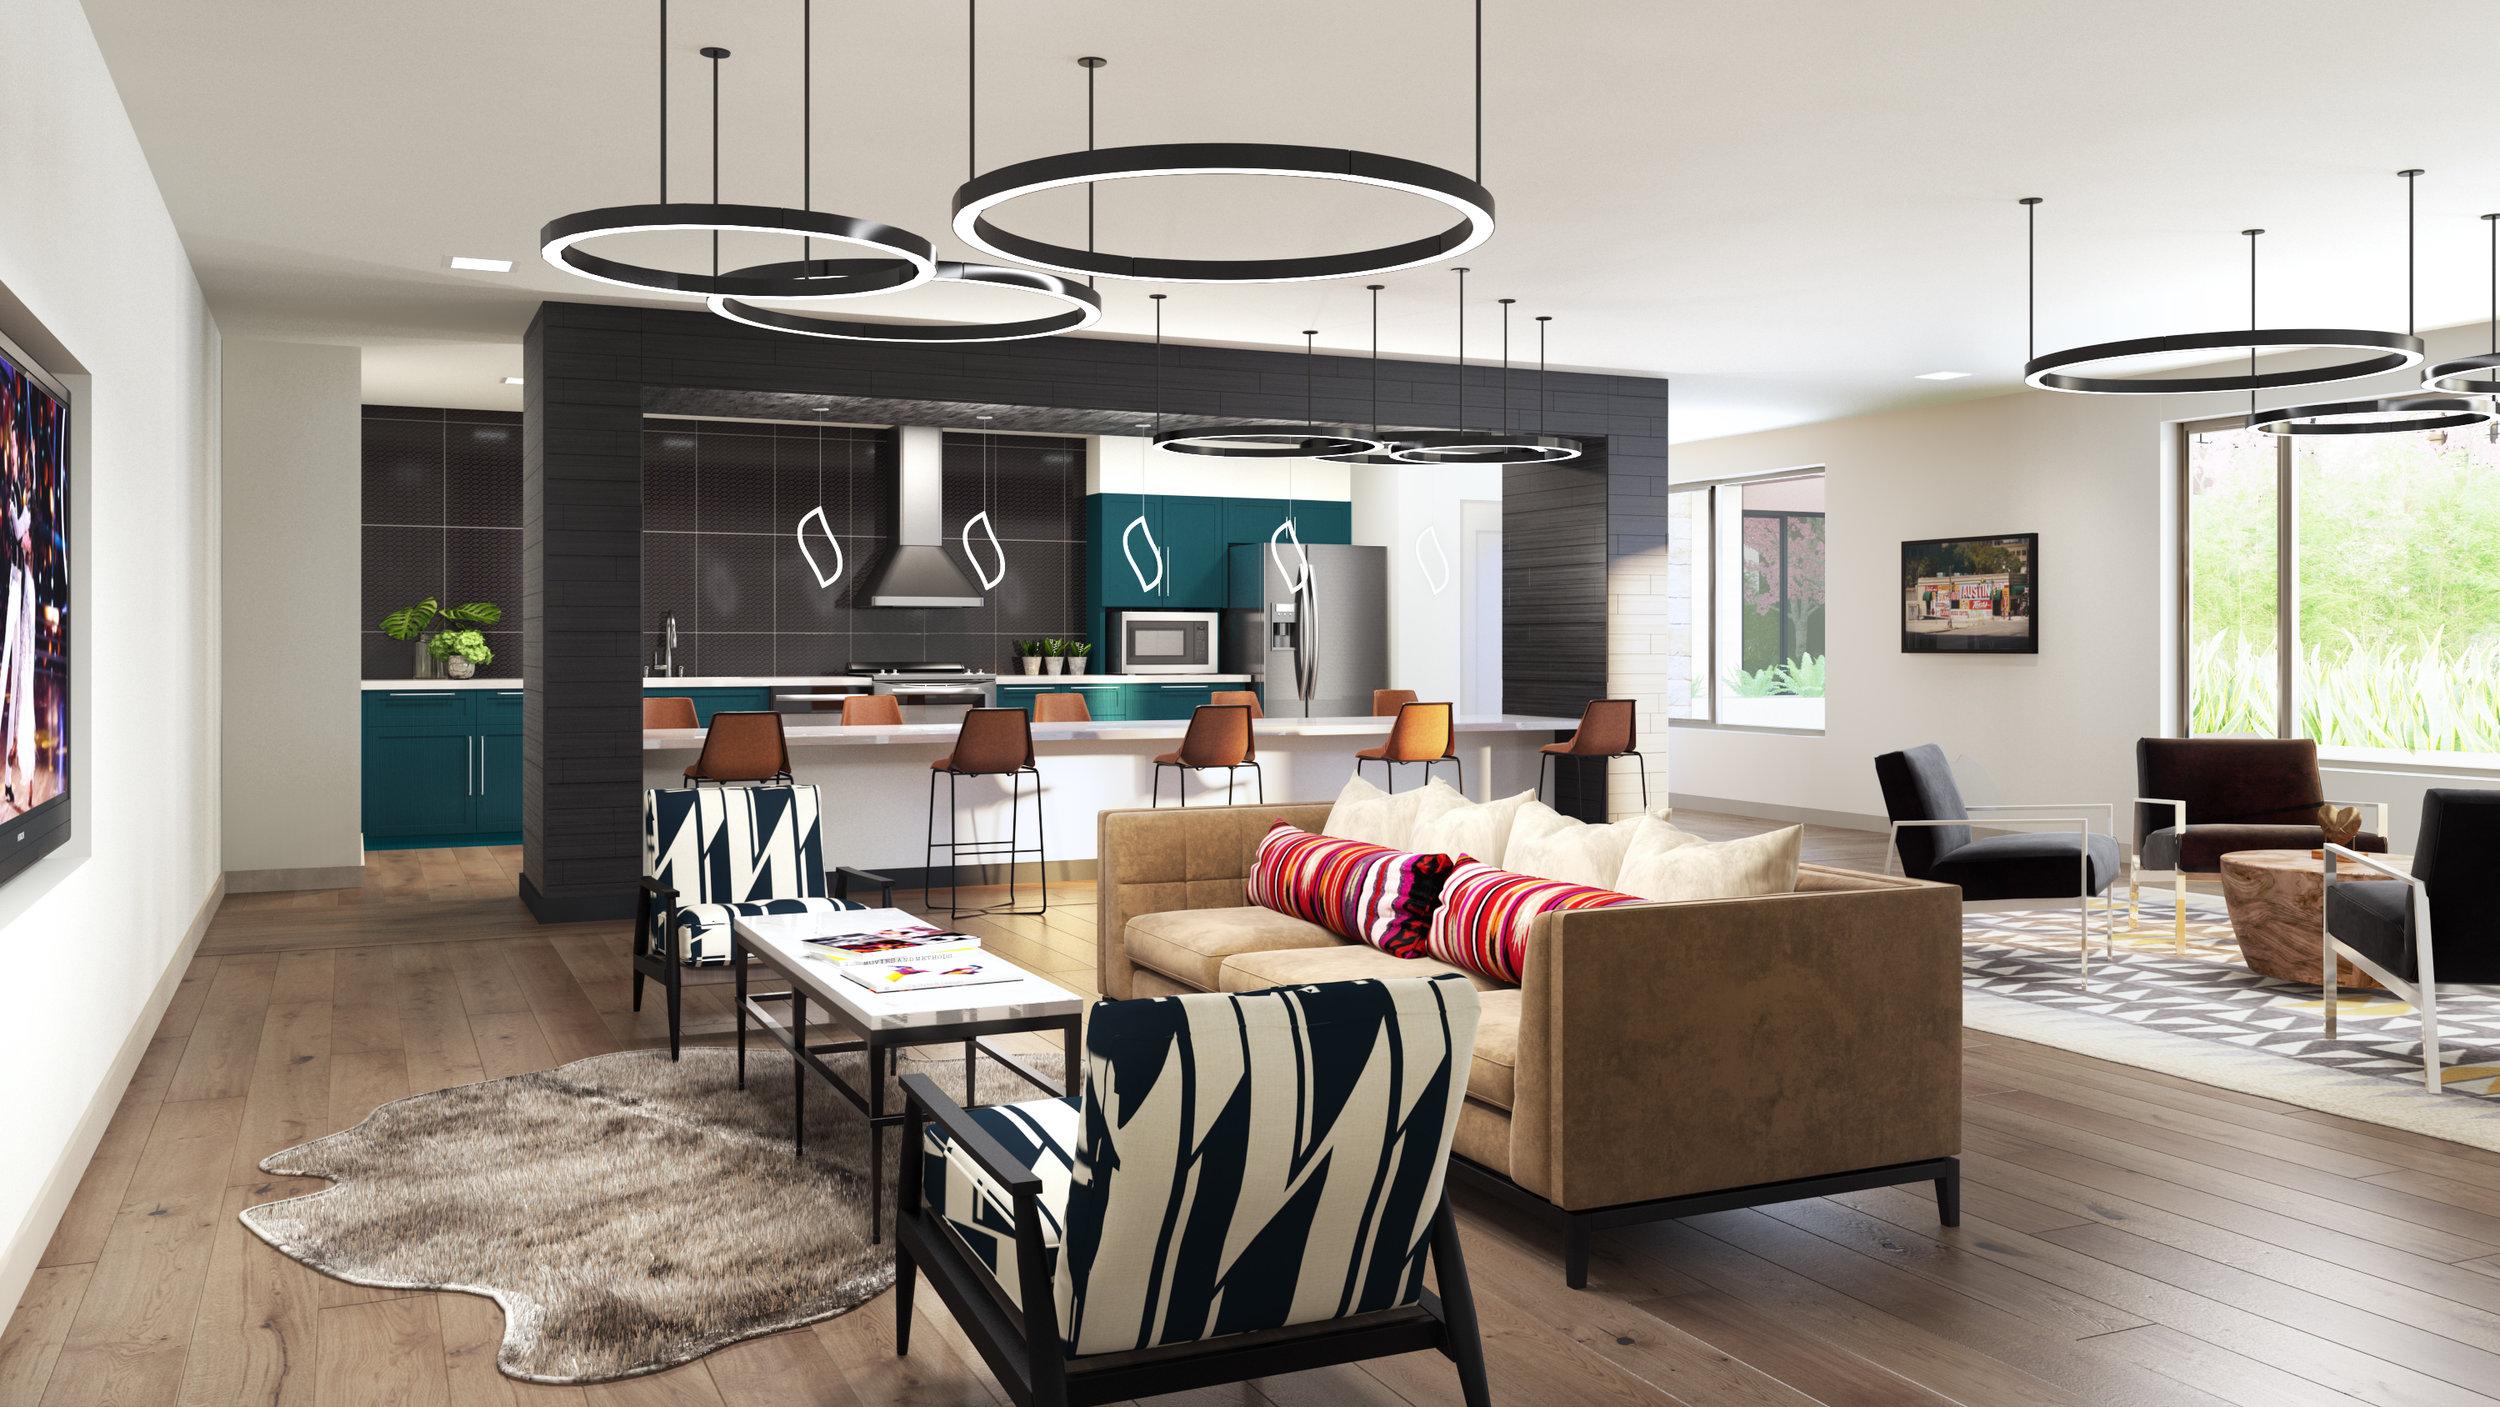 The Braxton apartments Social lounge party apartmetns